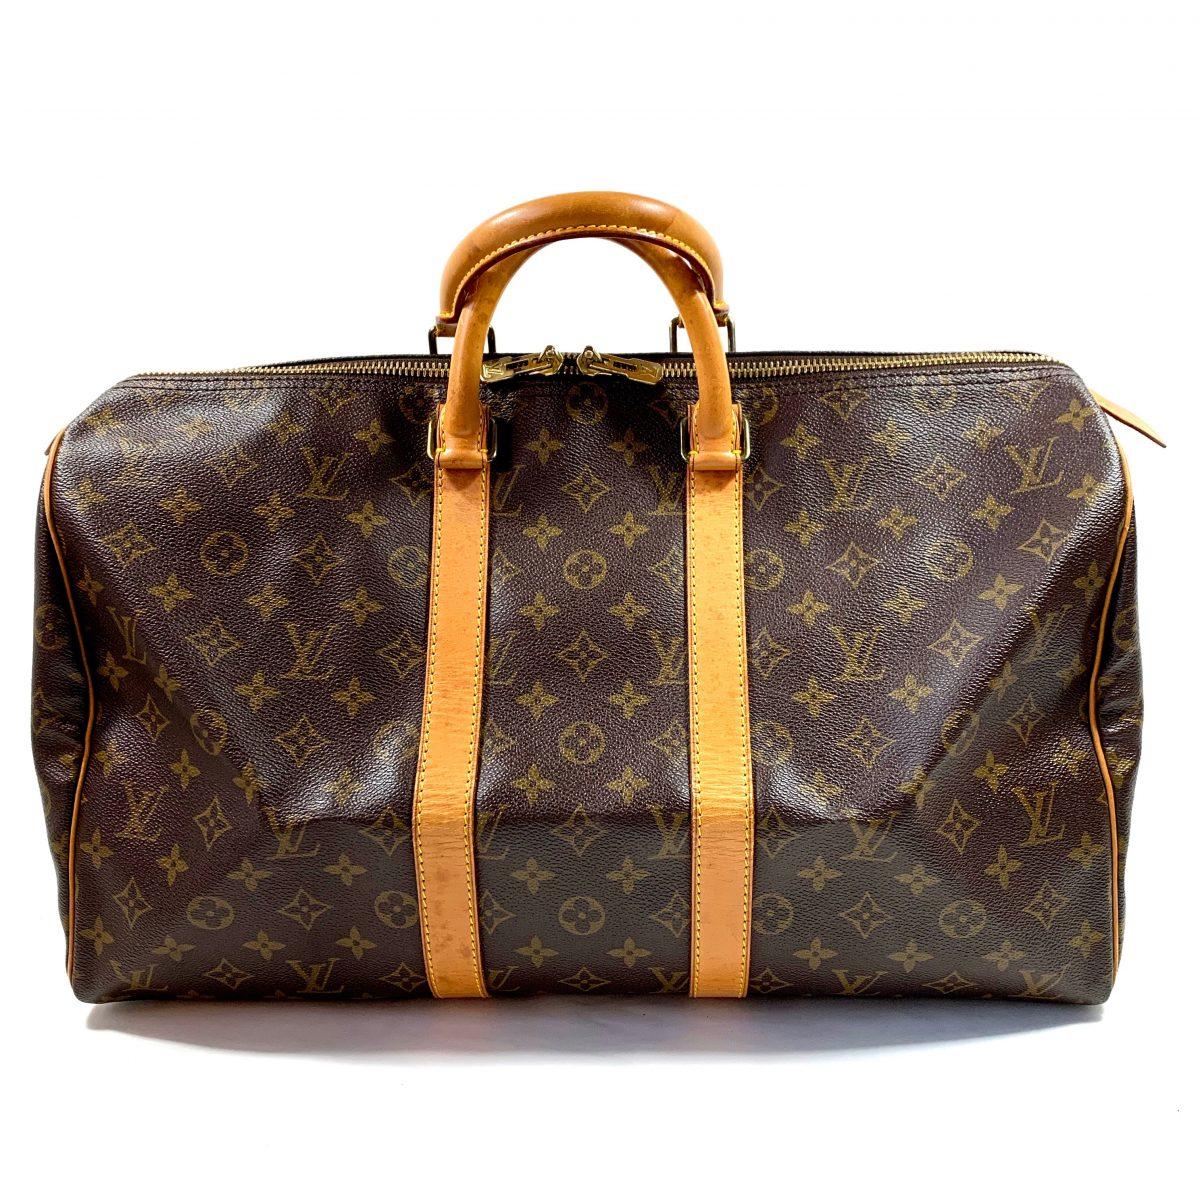 Louis Vuitton Keepall travel designer bag